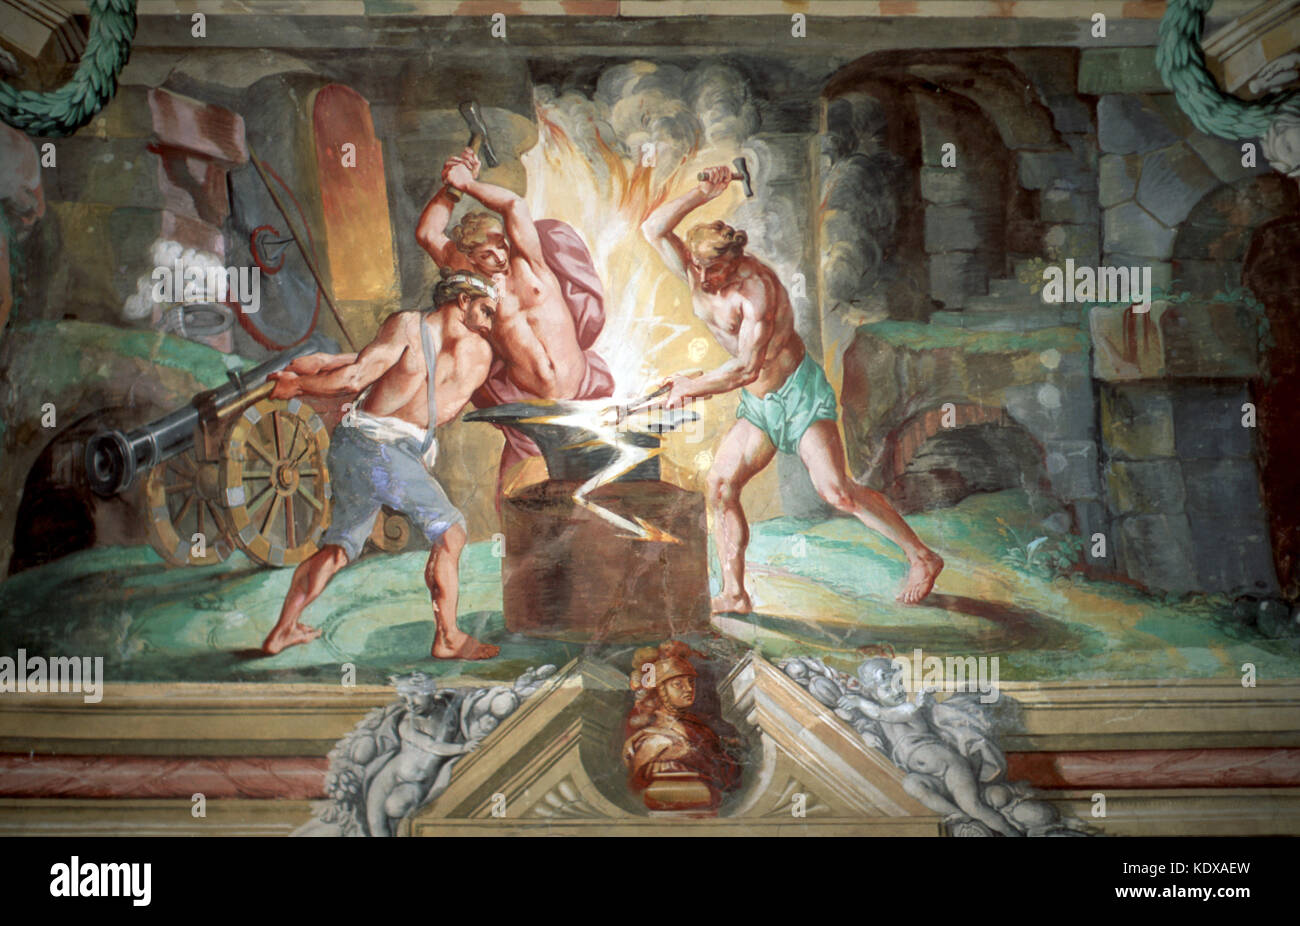 Slowenien, Brezice, im Schloss Brezice - Stock Image